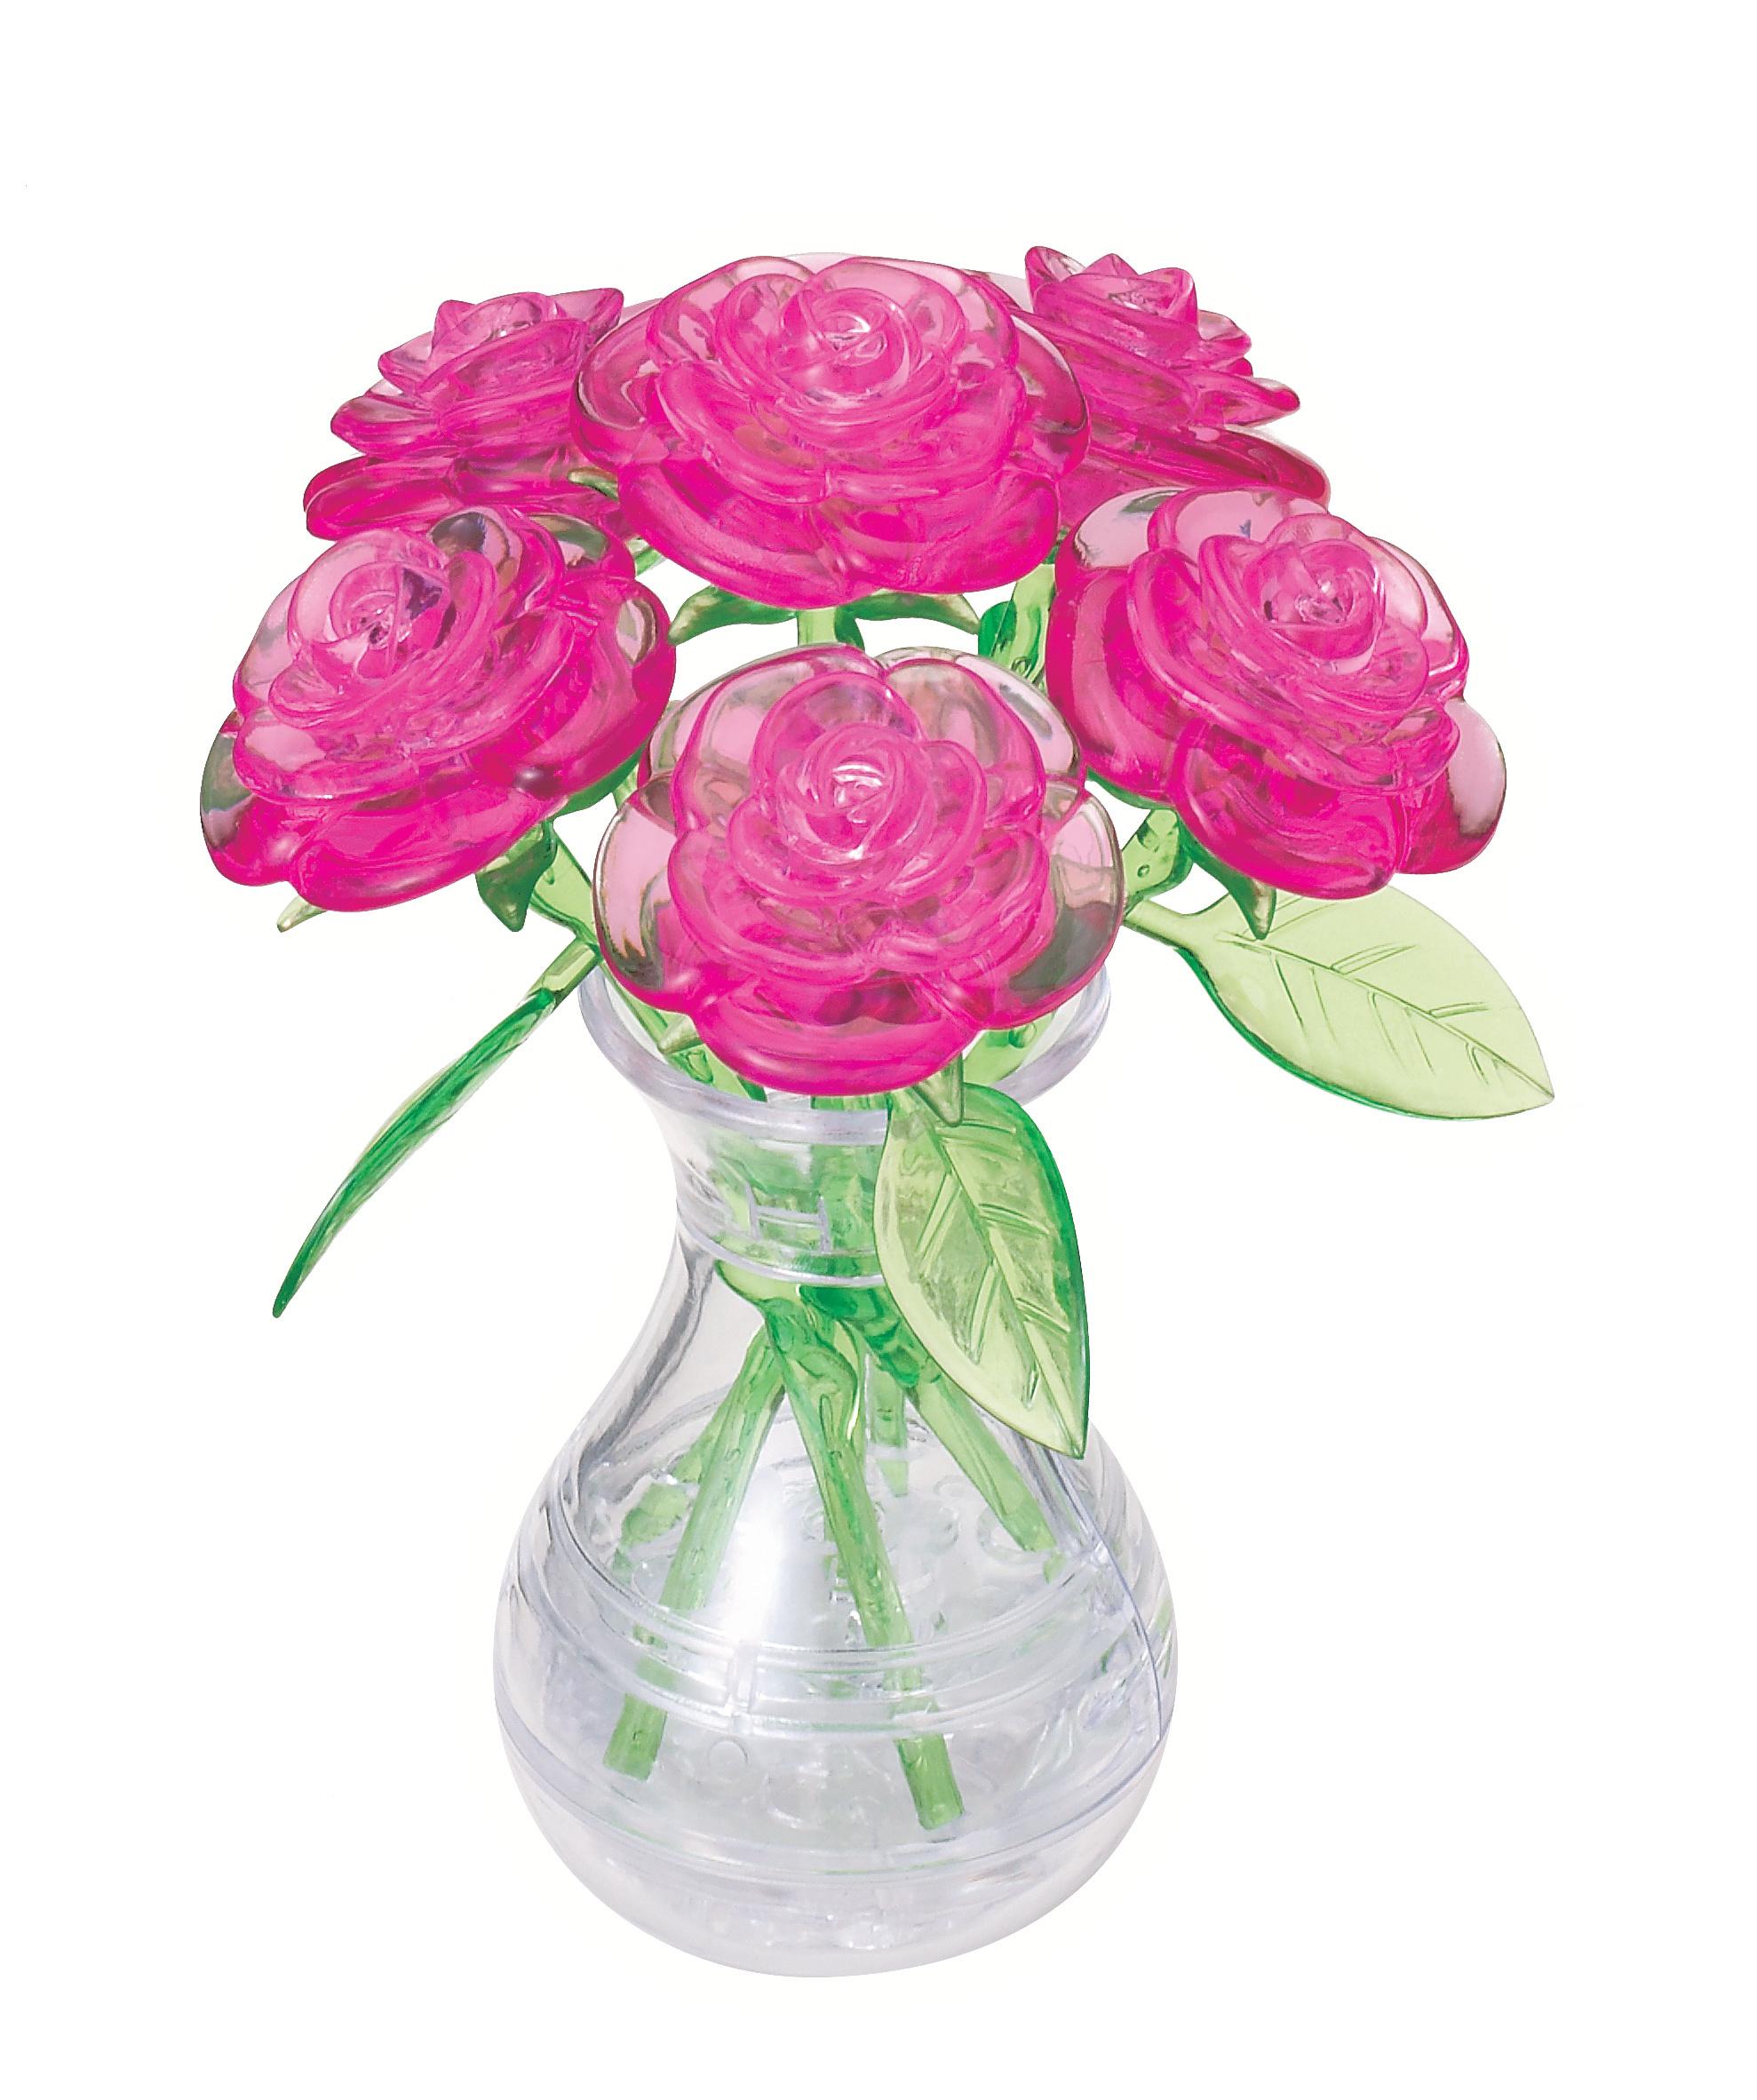 31073 Roses in Vase - Pink